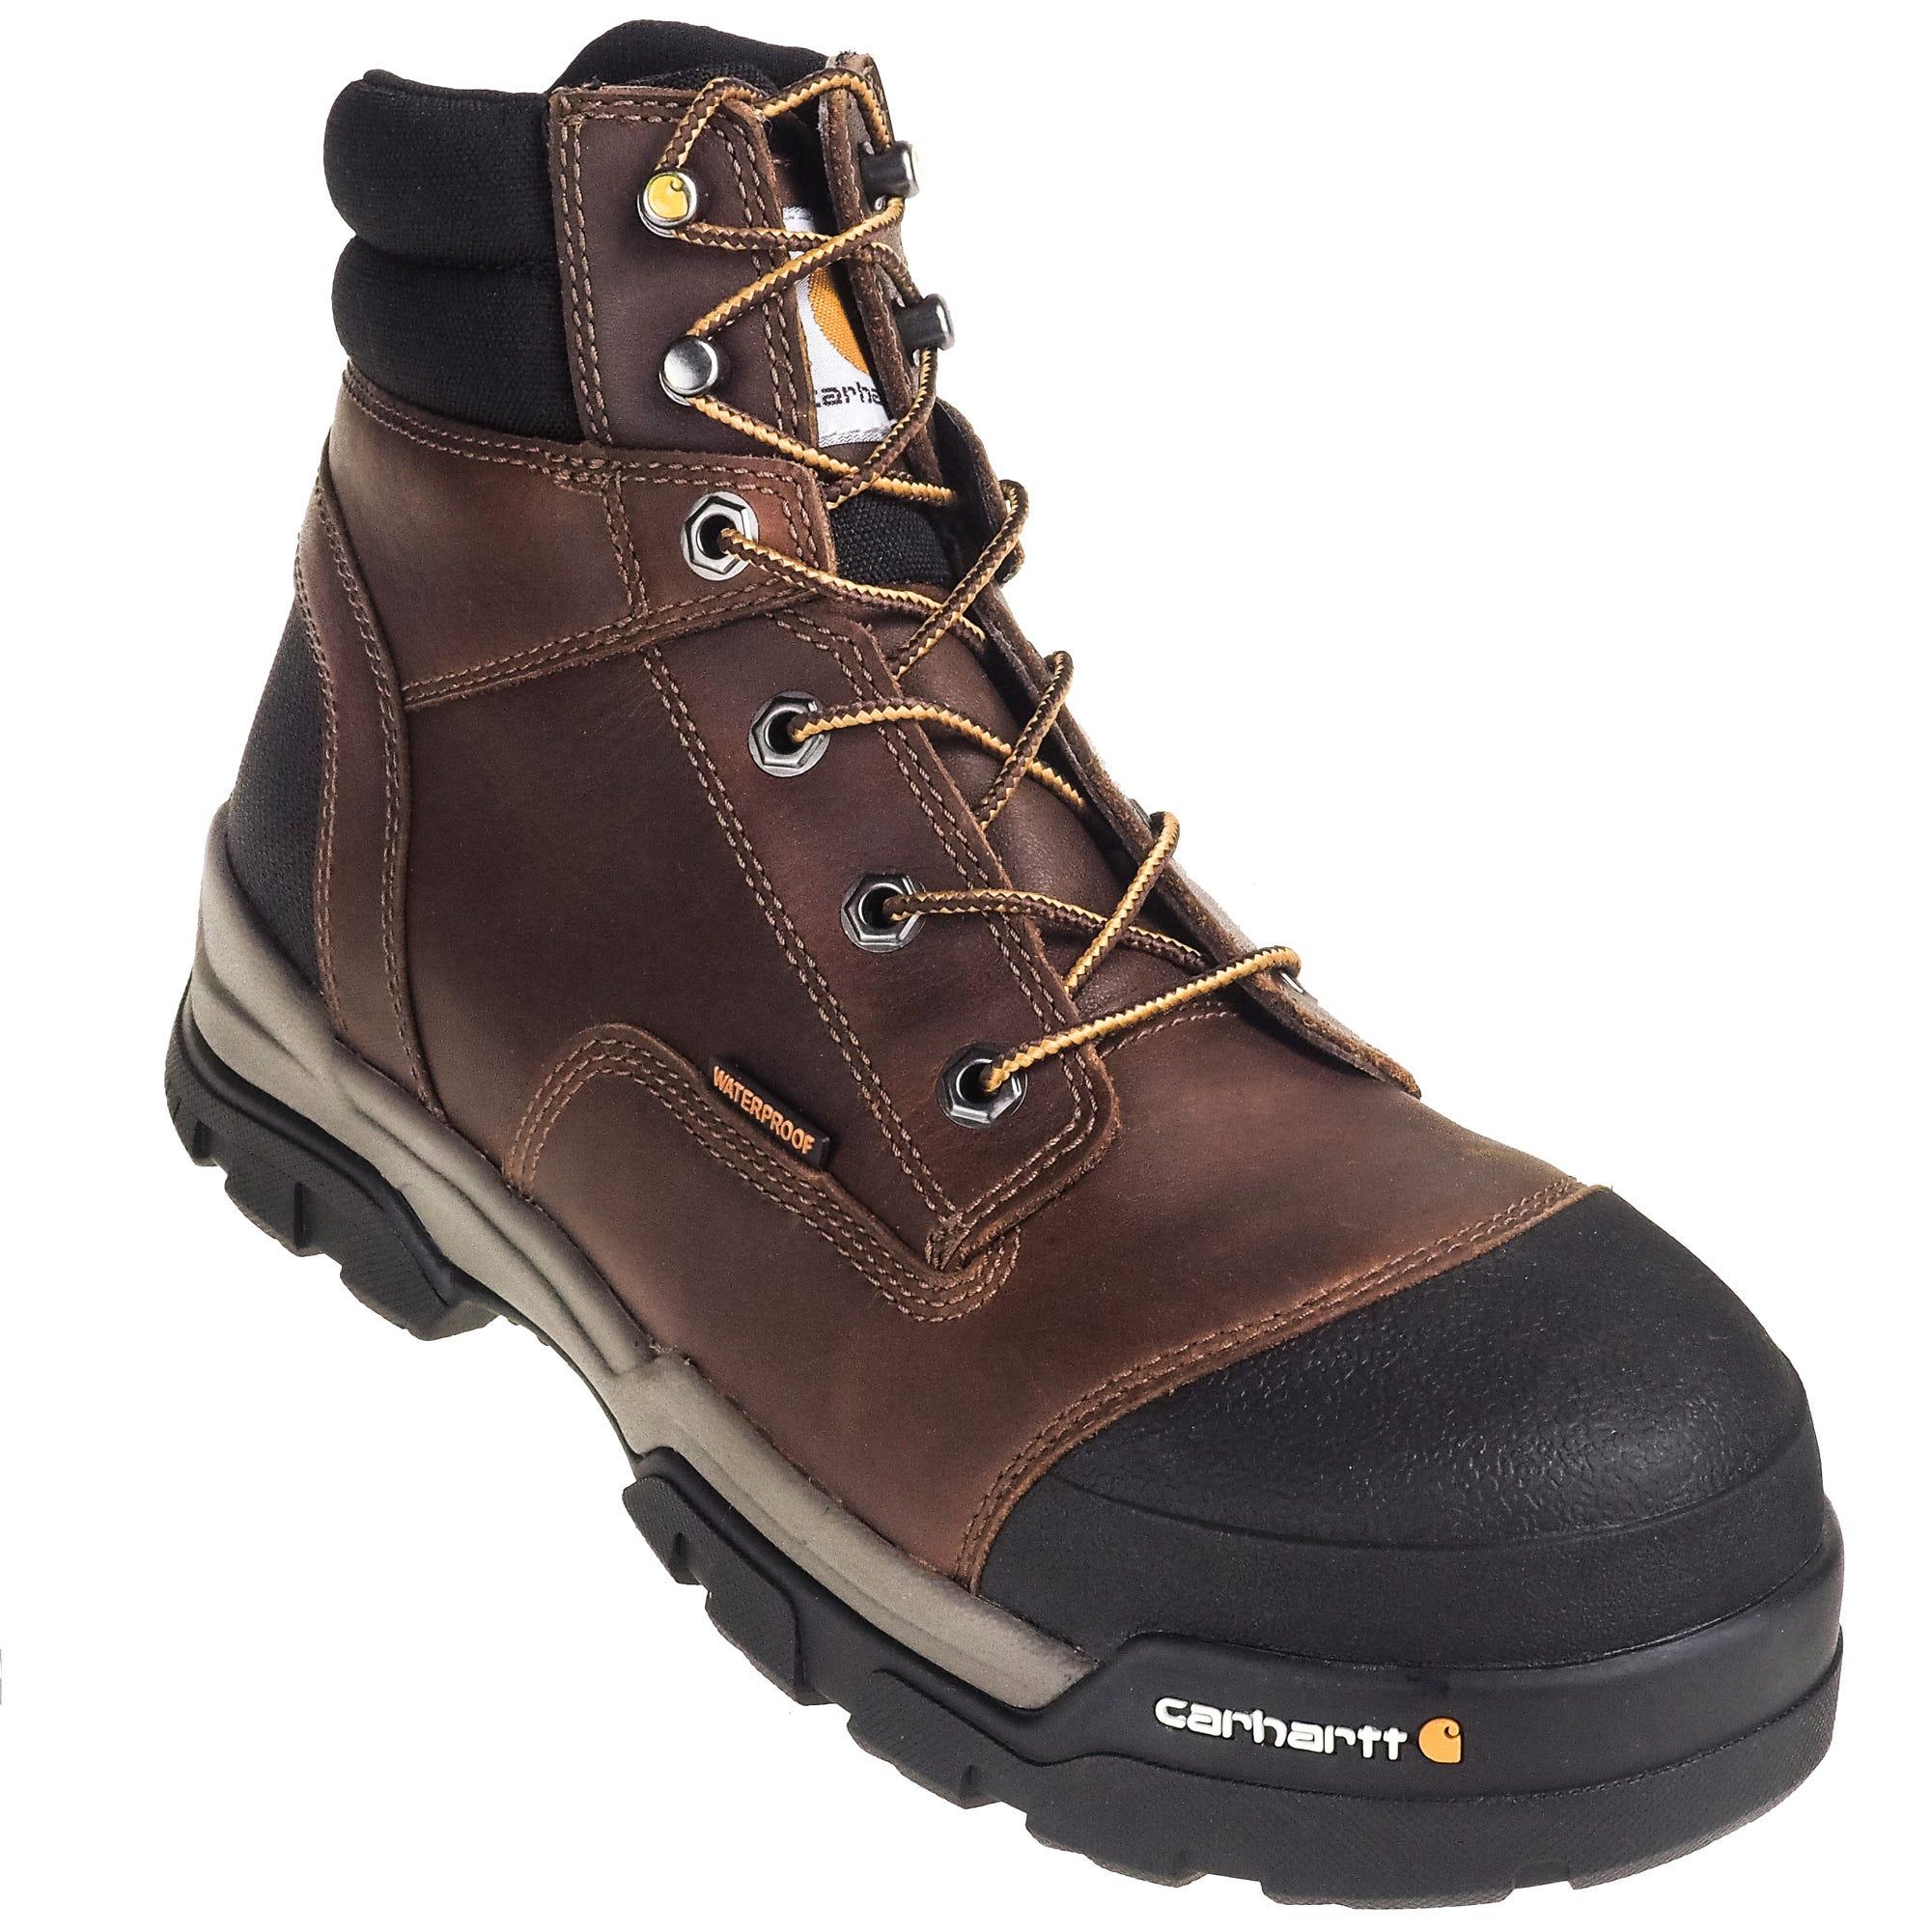 f176fdaf0c0 Carhartt Boots: Men's CME6355 Energy 6-Inch Waterproof Composite Toe ...